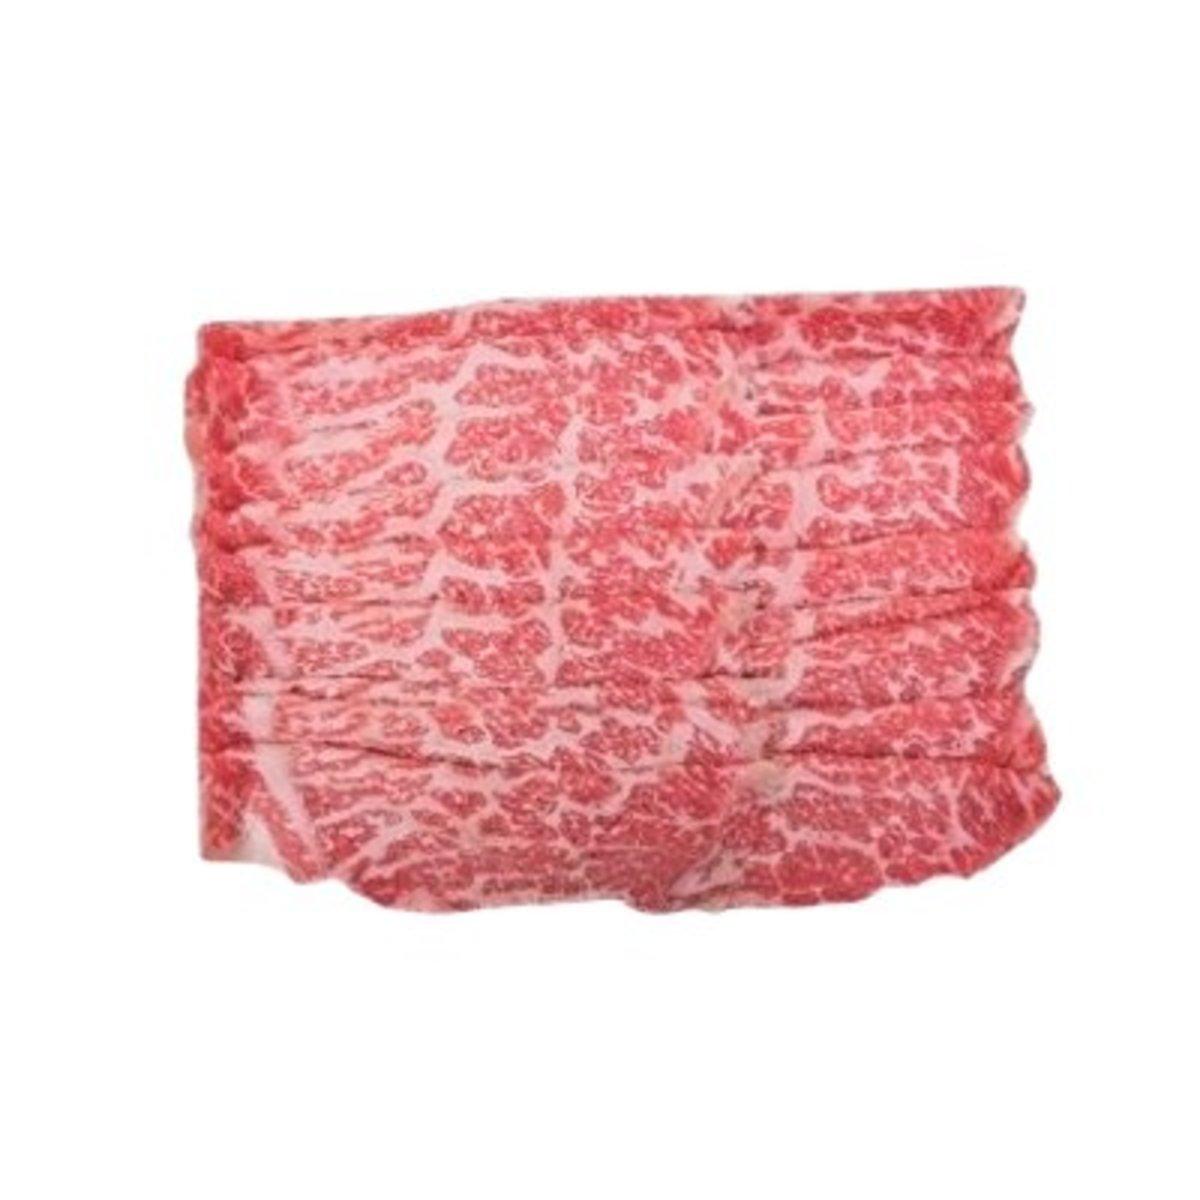 JAPANESE A4 WAGYU BEEF SLICED (200g) (Frozen)